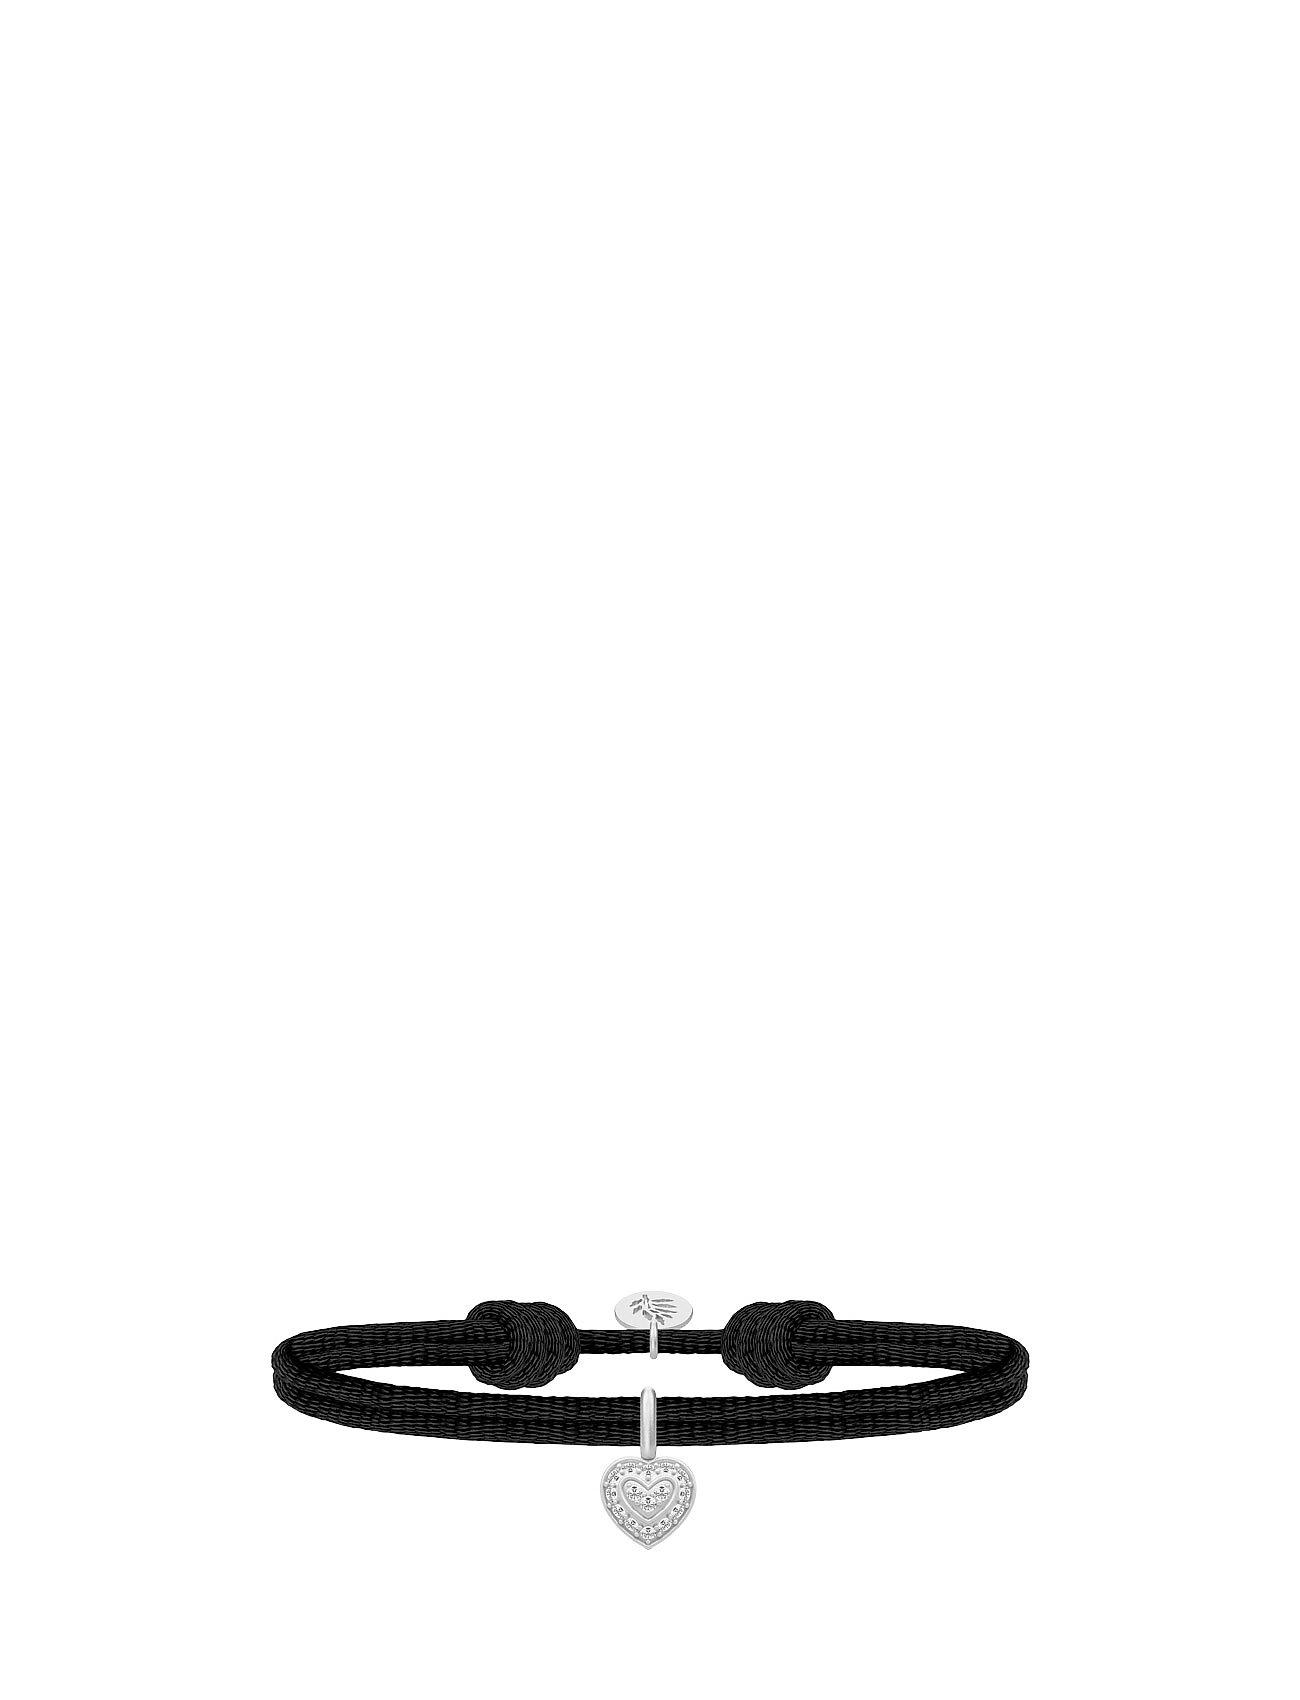 Sweetheart Satin Bracelet - Rh Julie Sandlau Smykker til Damer i Sort